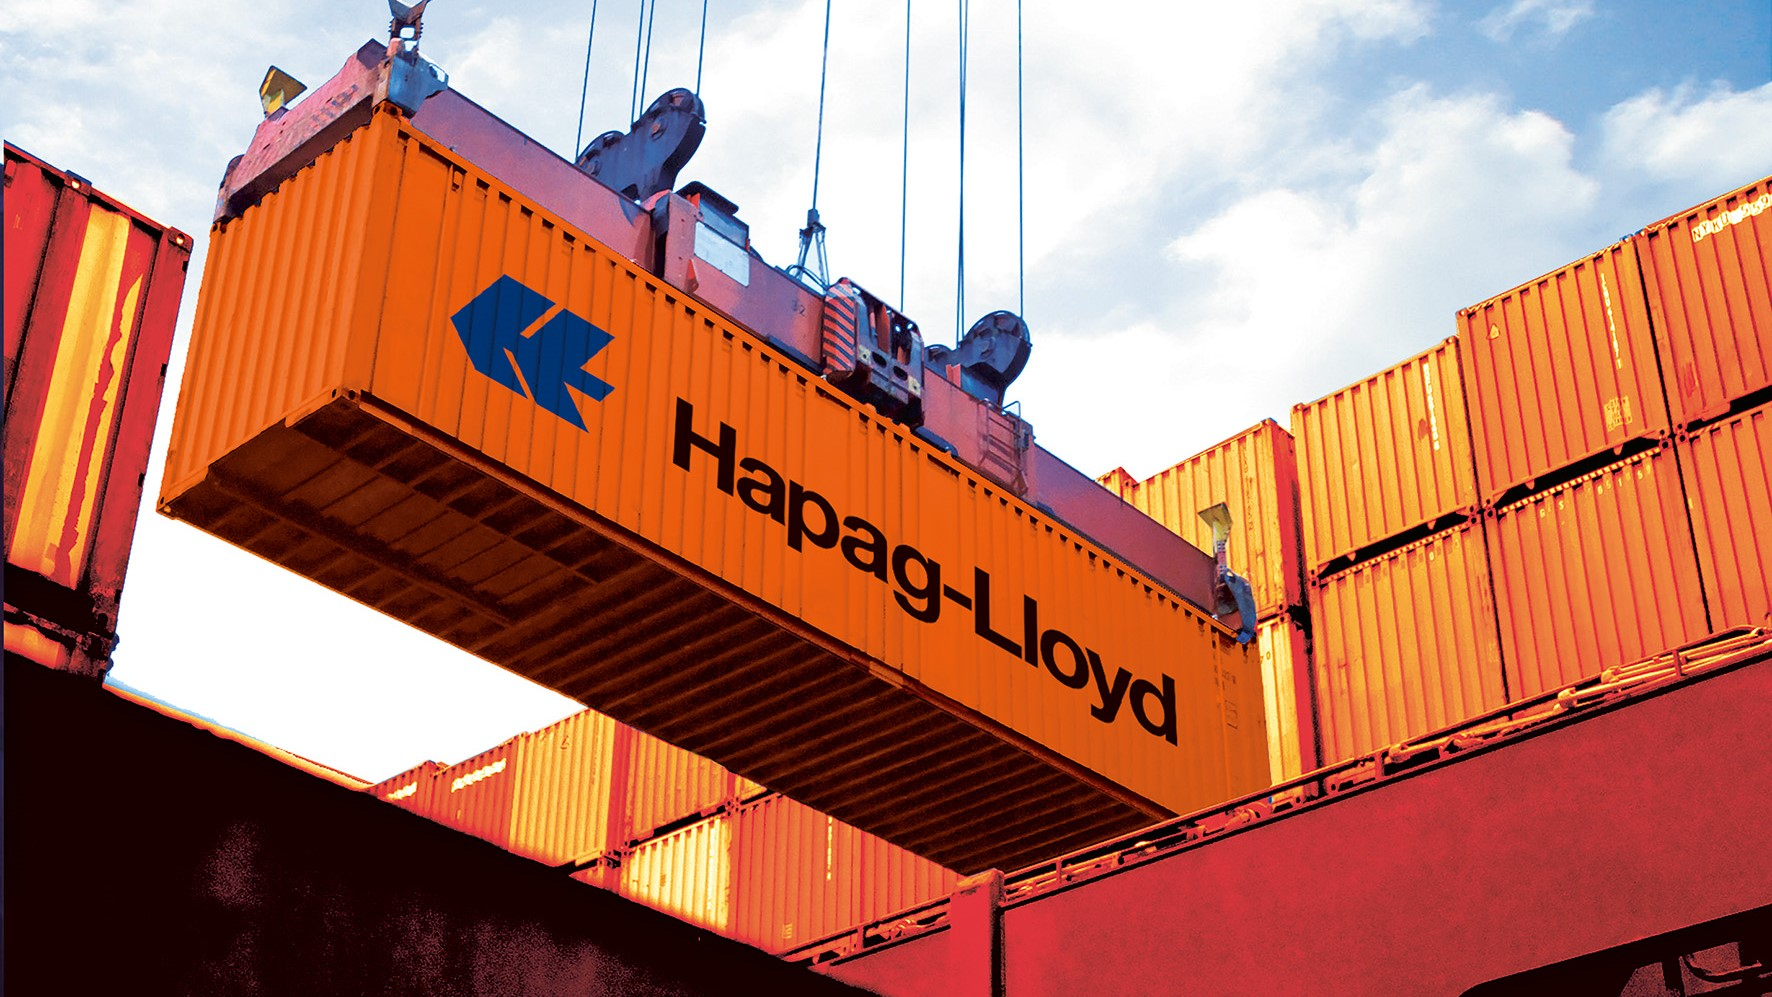 Moody´s has upgraded Hapag-Lloyd credit rating to B1 1